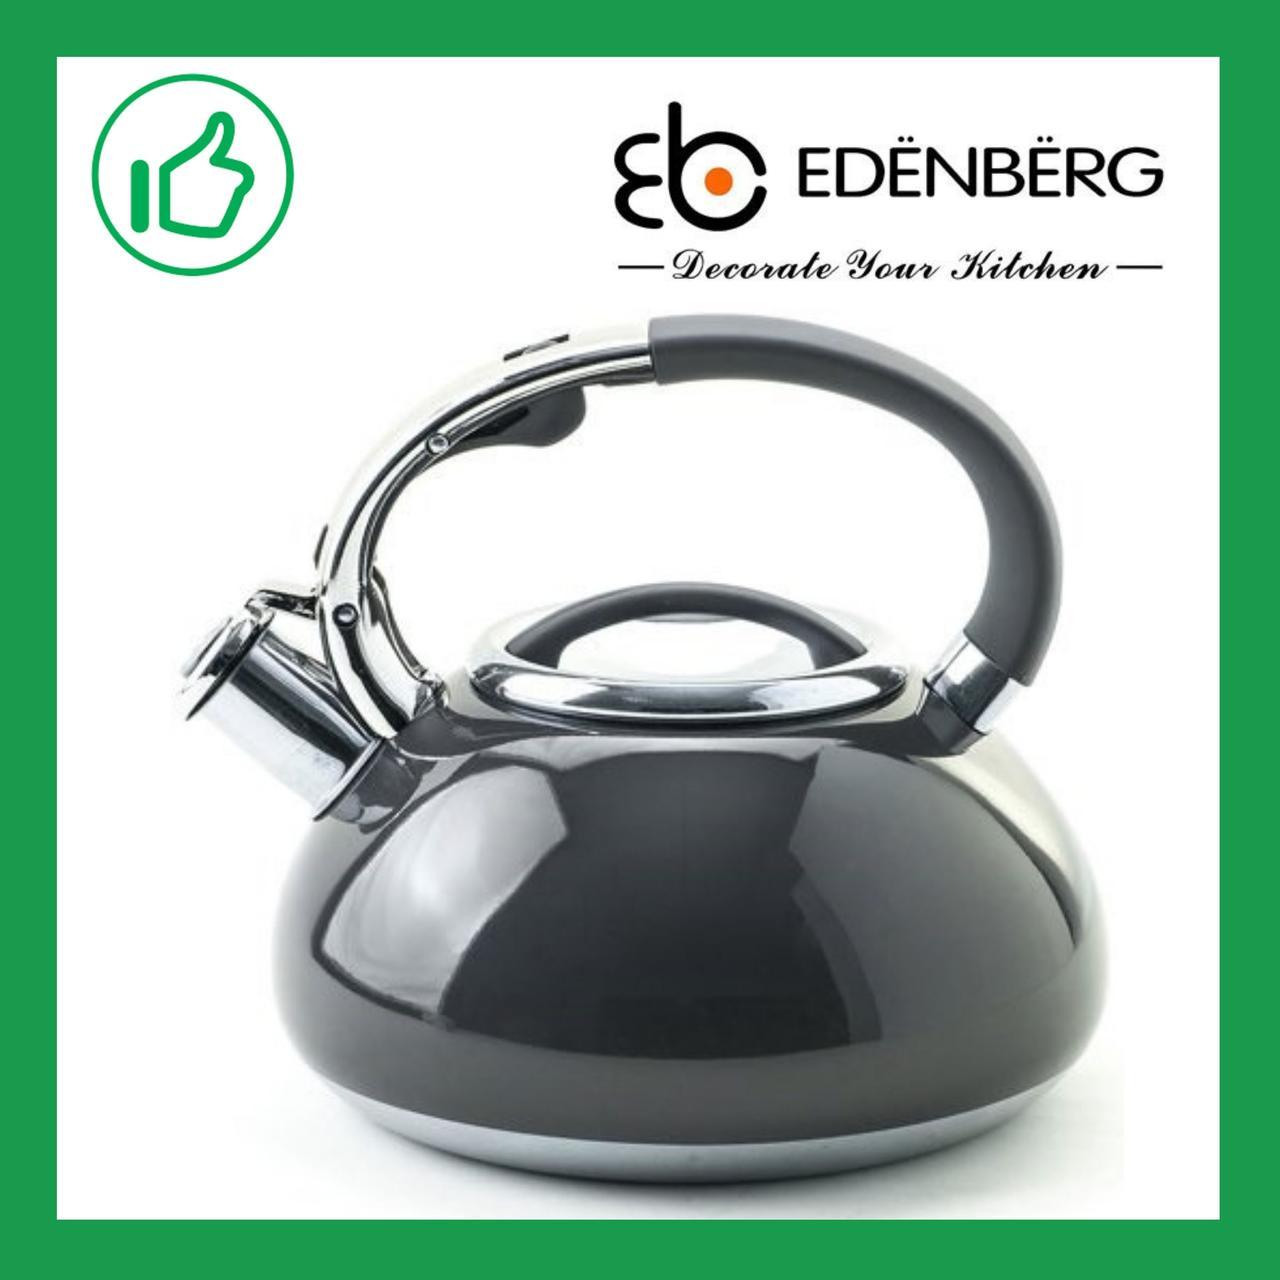 Чайник со свистком Edenberg 3.0 л Серый (EB-2452GR)